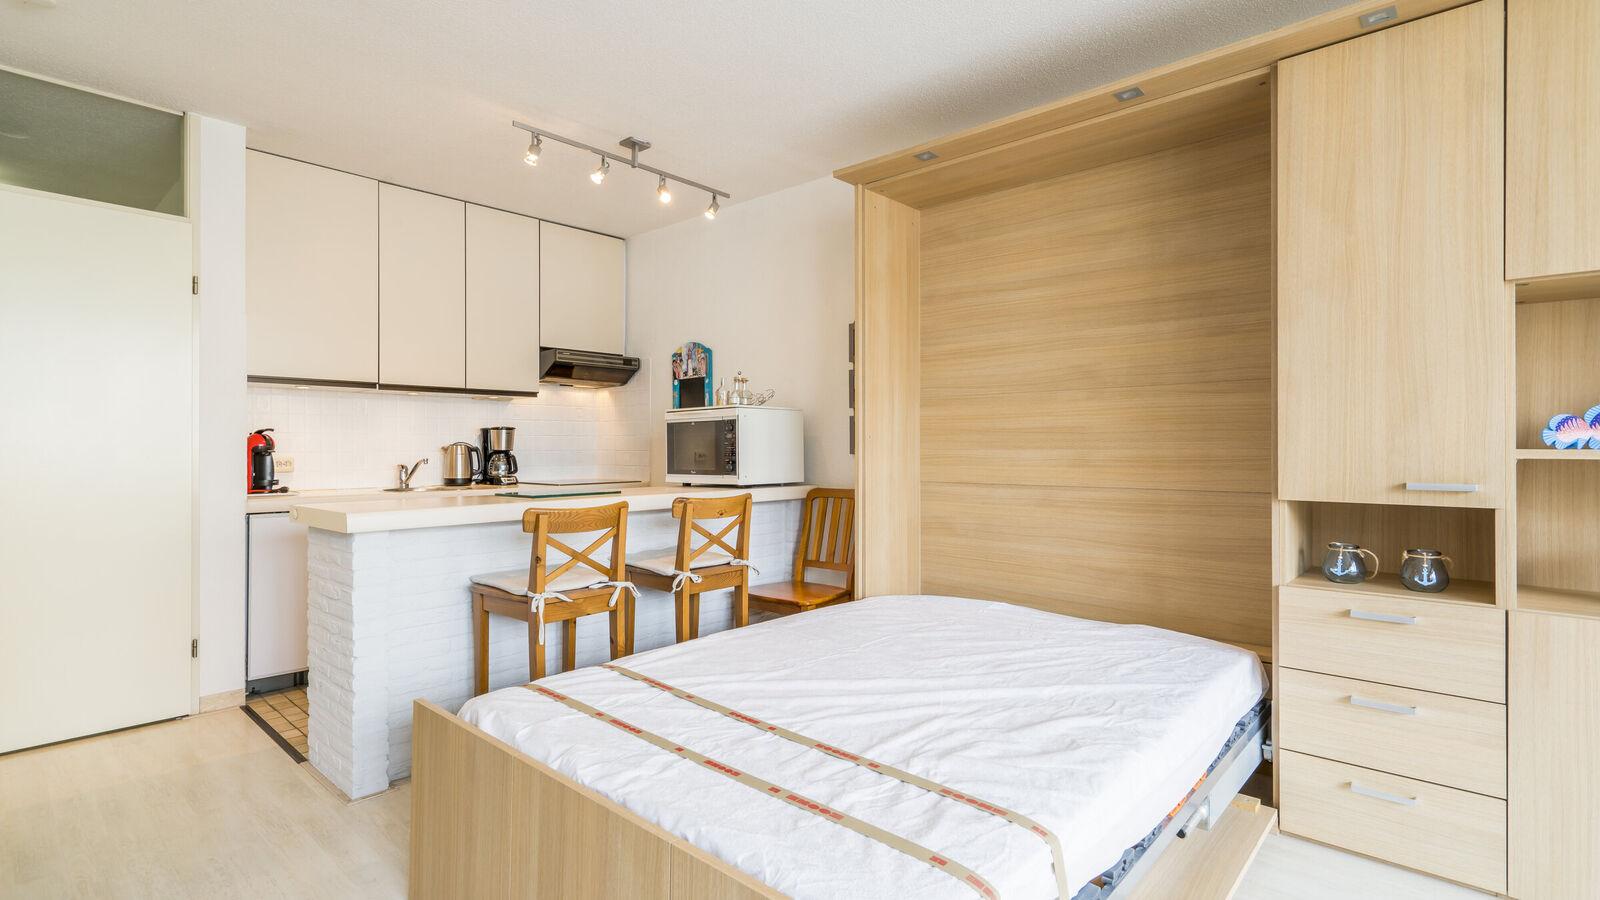 Appartement avec coin de sommeil à Koksijde